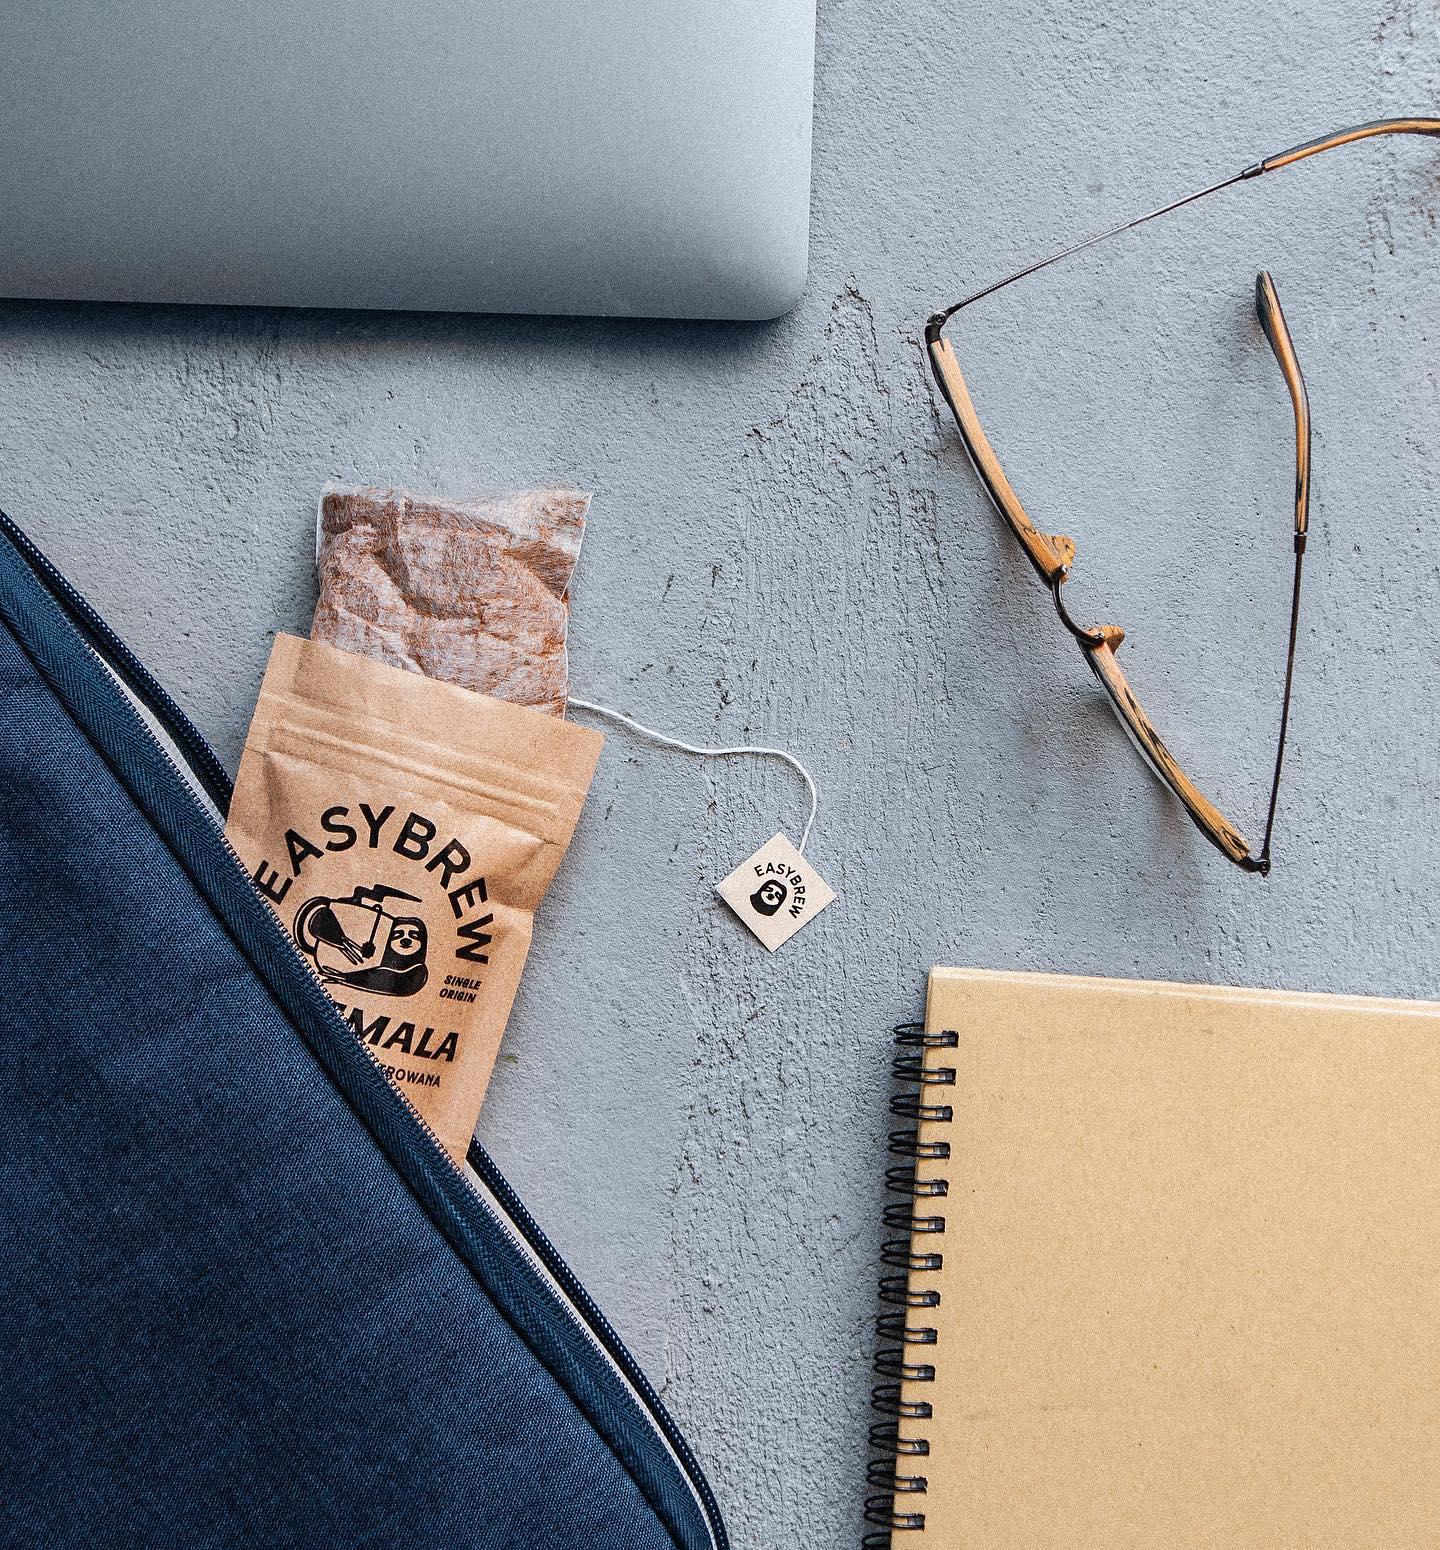 Zeki Michael Design - EasyBrew Coffee1.jpg